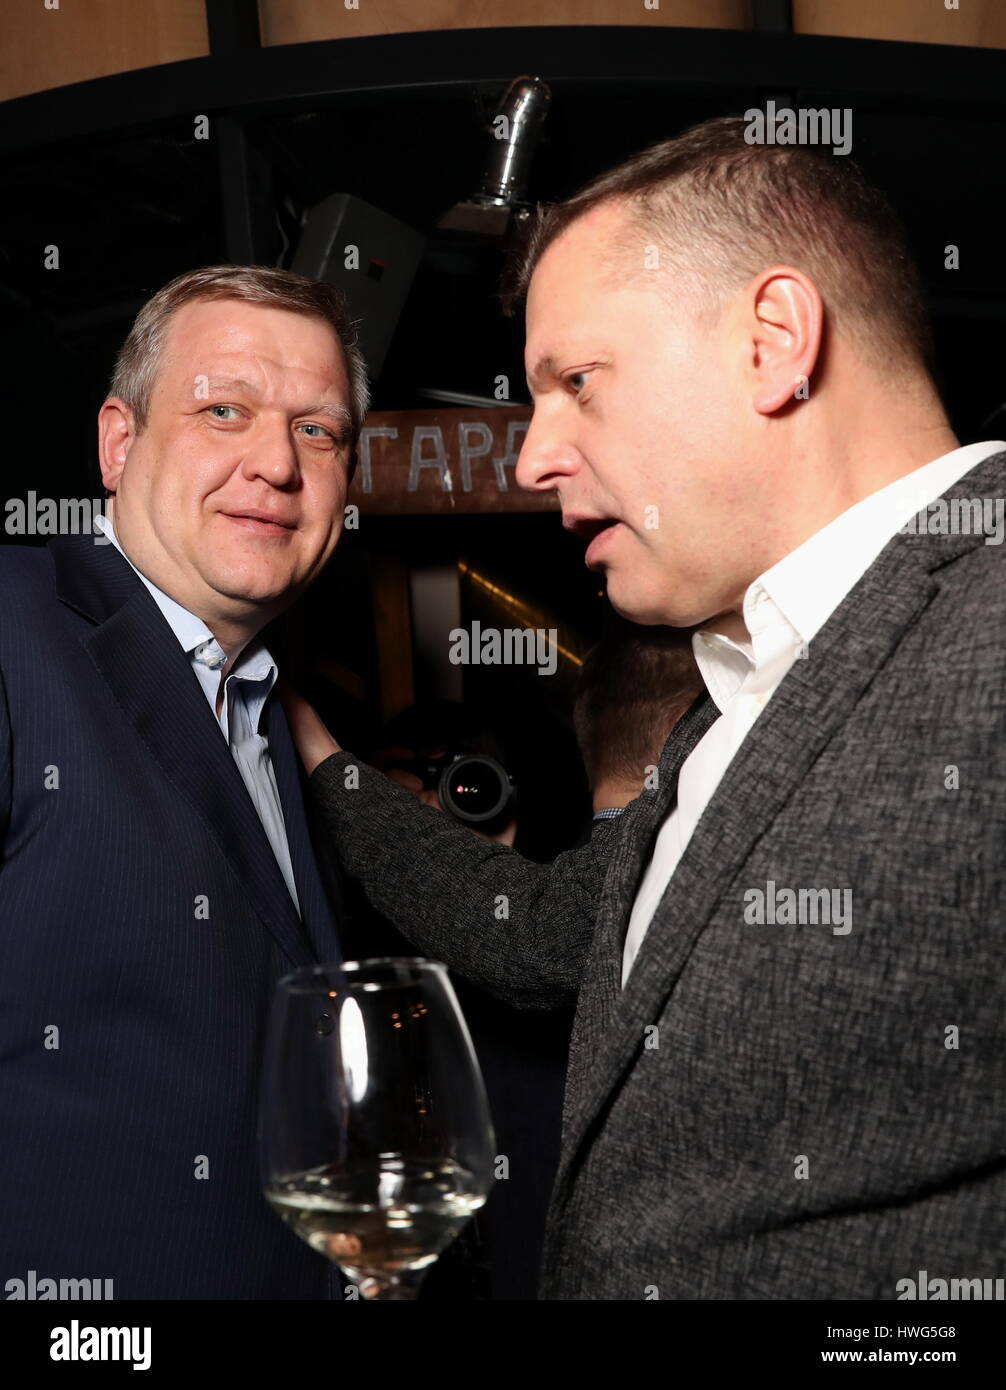 Ksenia Sobchak and Sergey Kapkov split up 05/18/2011 3